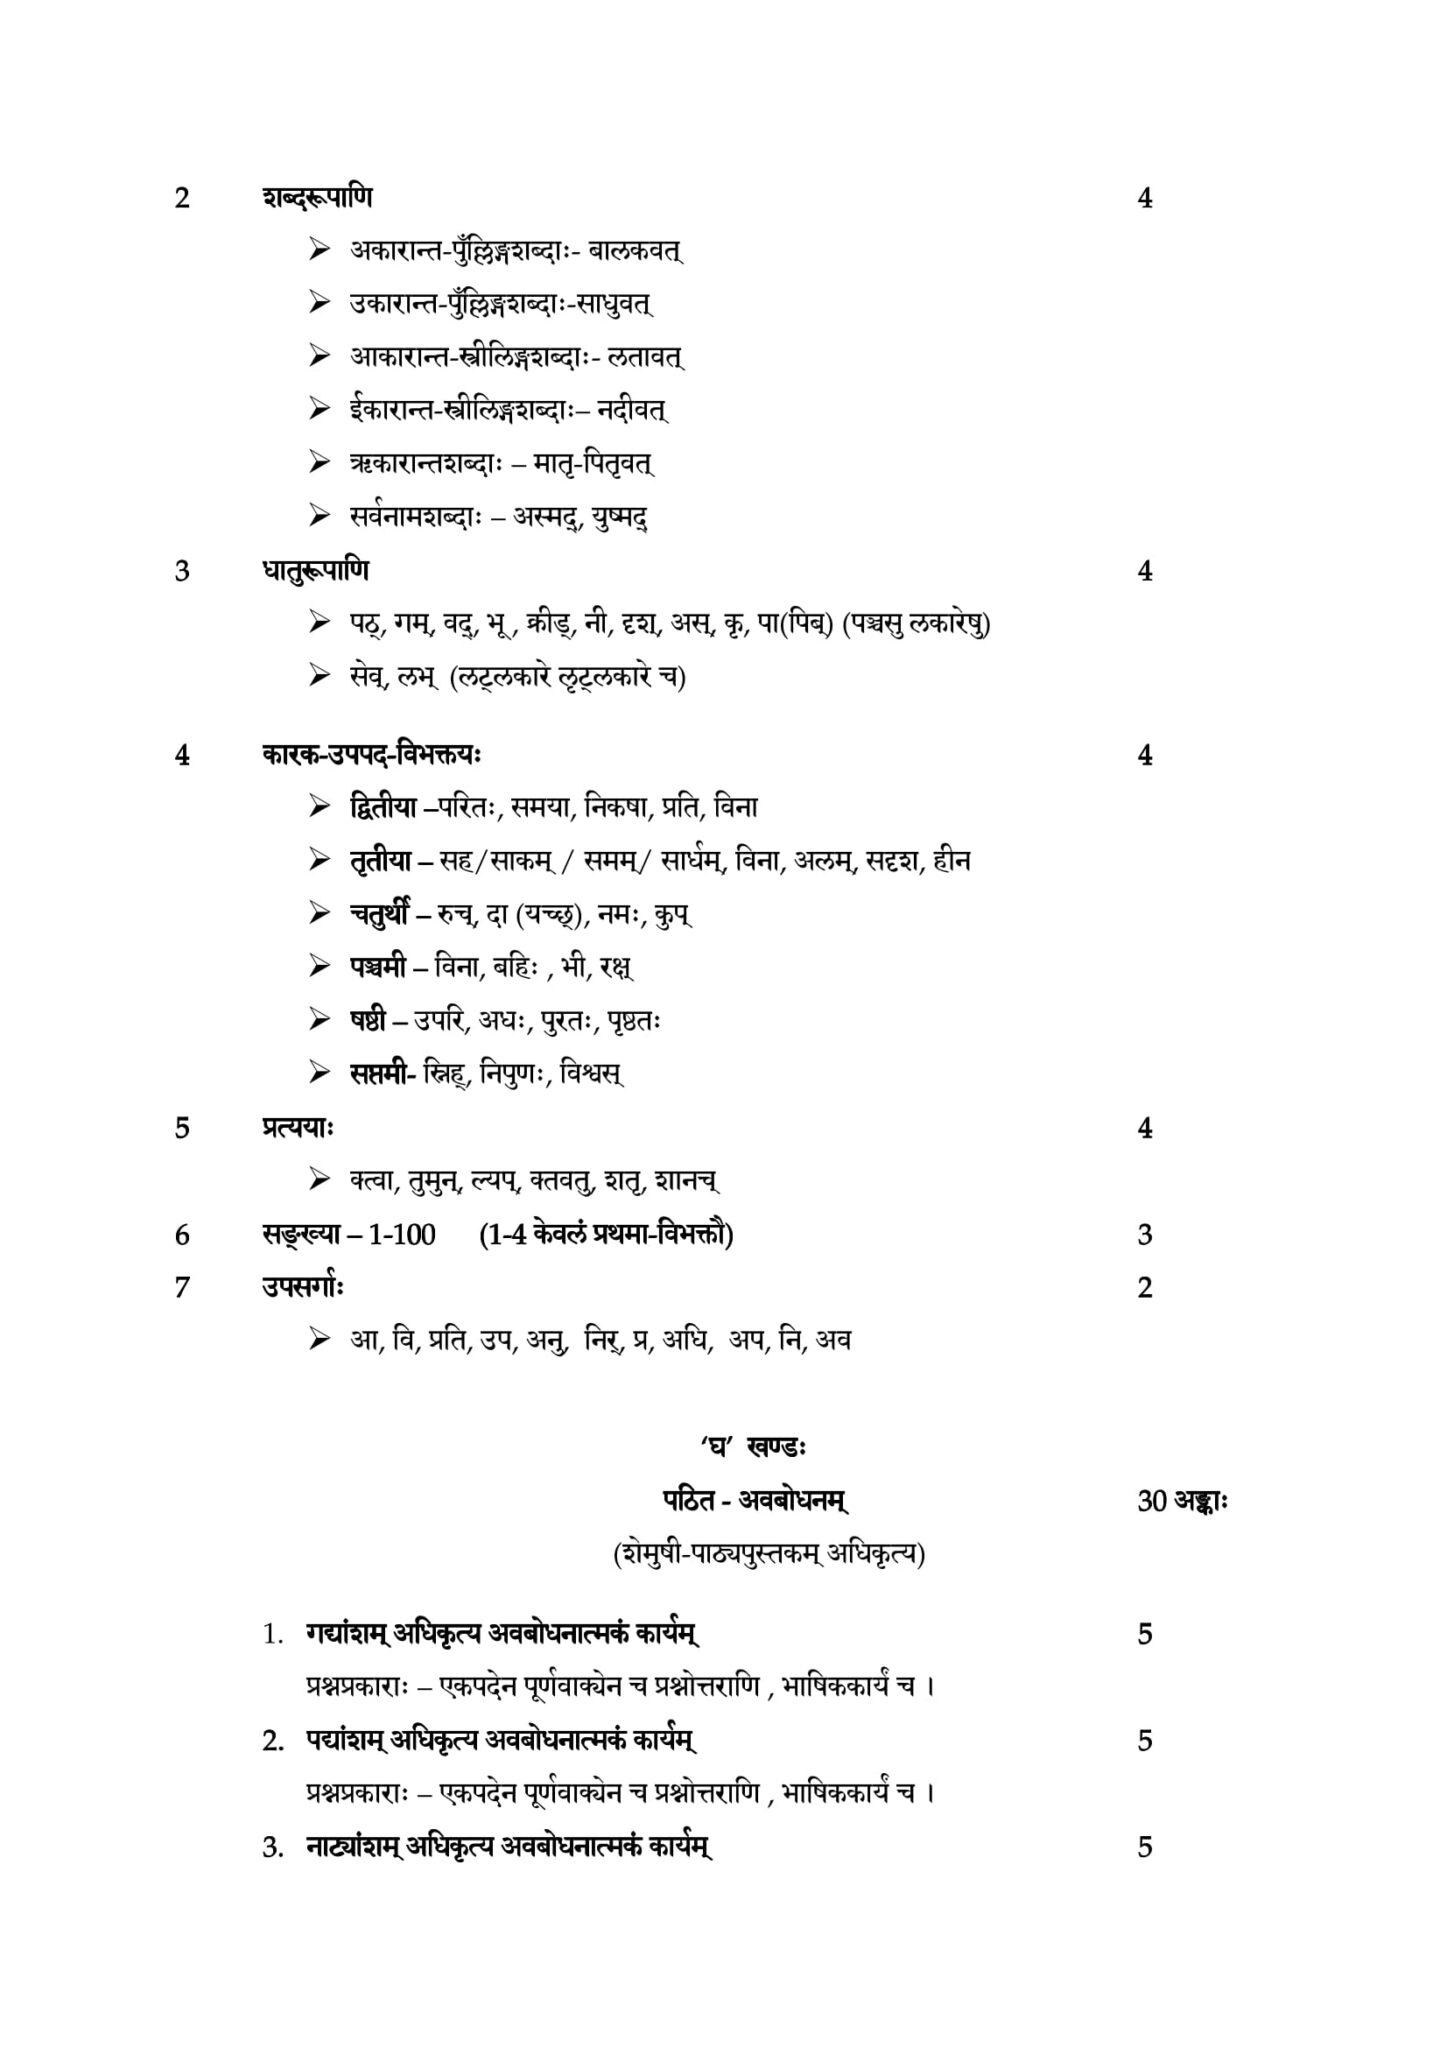 Sanskrit Sec 2020 21 class 9 10 11